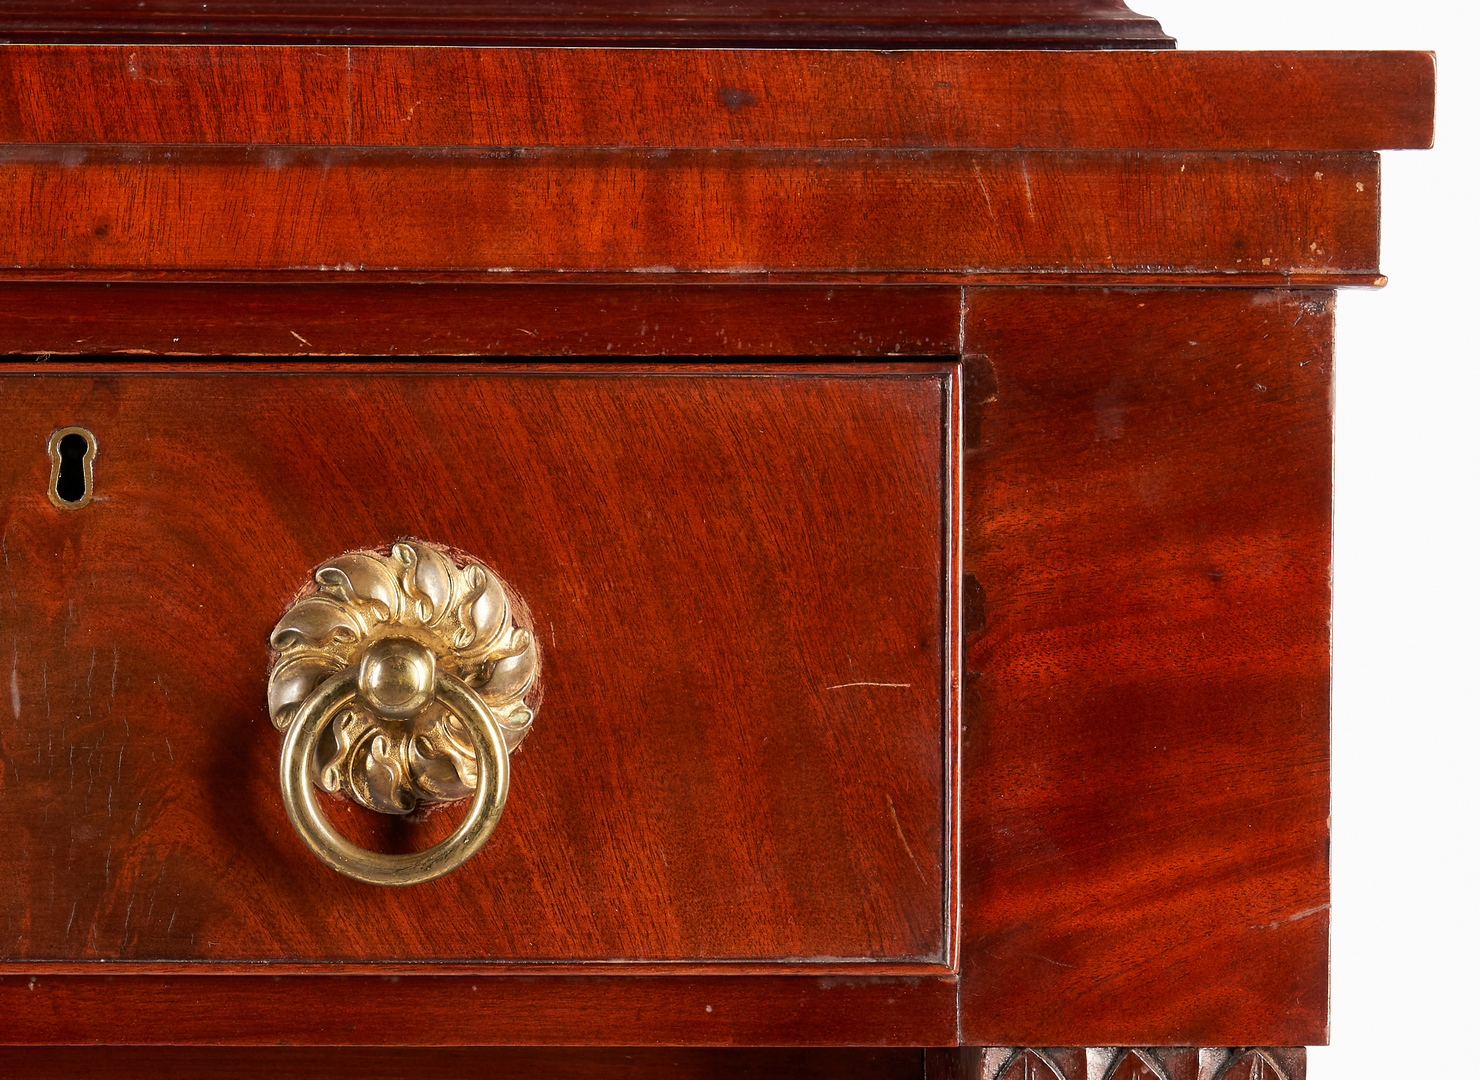 Lot 232: Classical Mahogany Chest of Drawers, poss. Boston